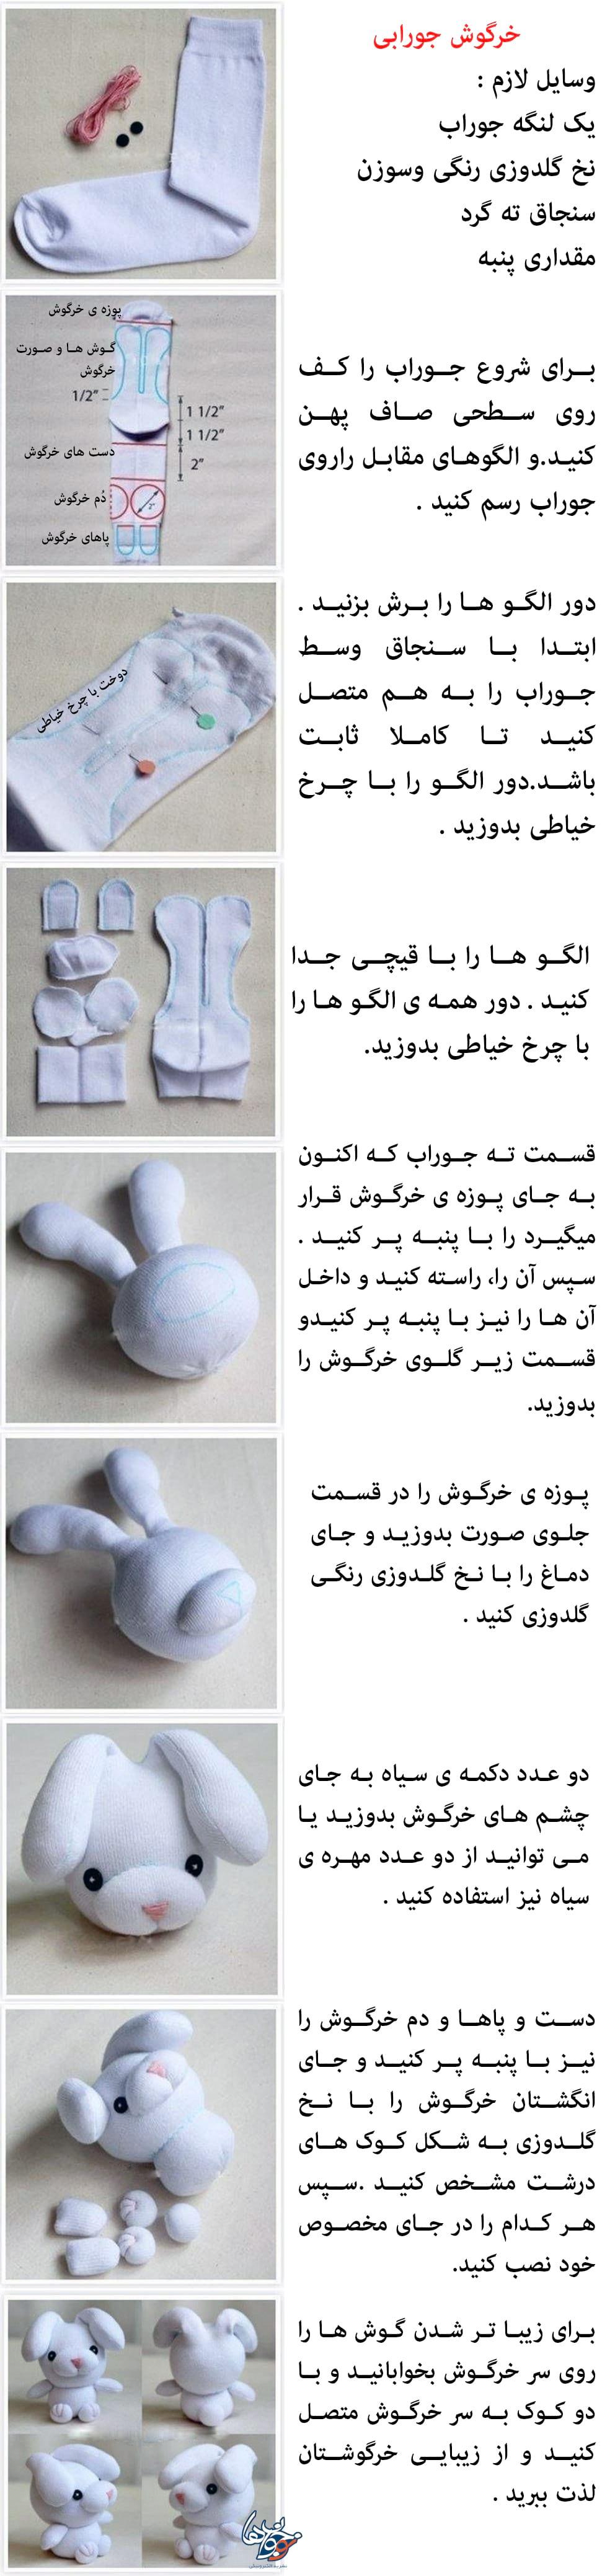 خرگوش جورابی (1)